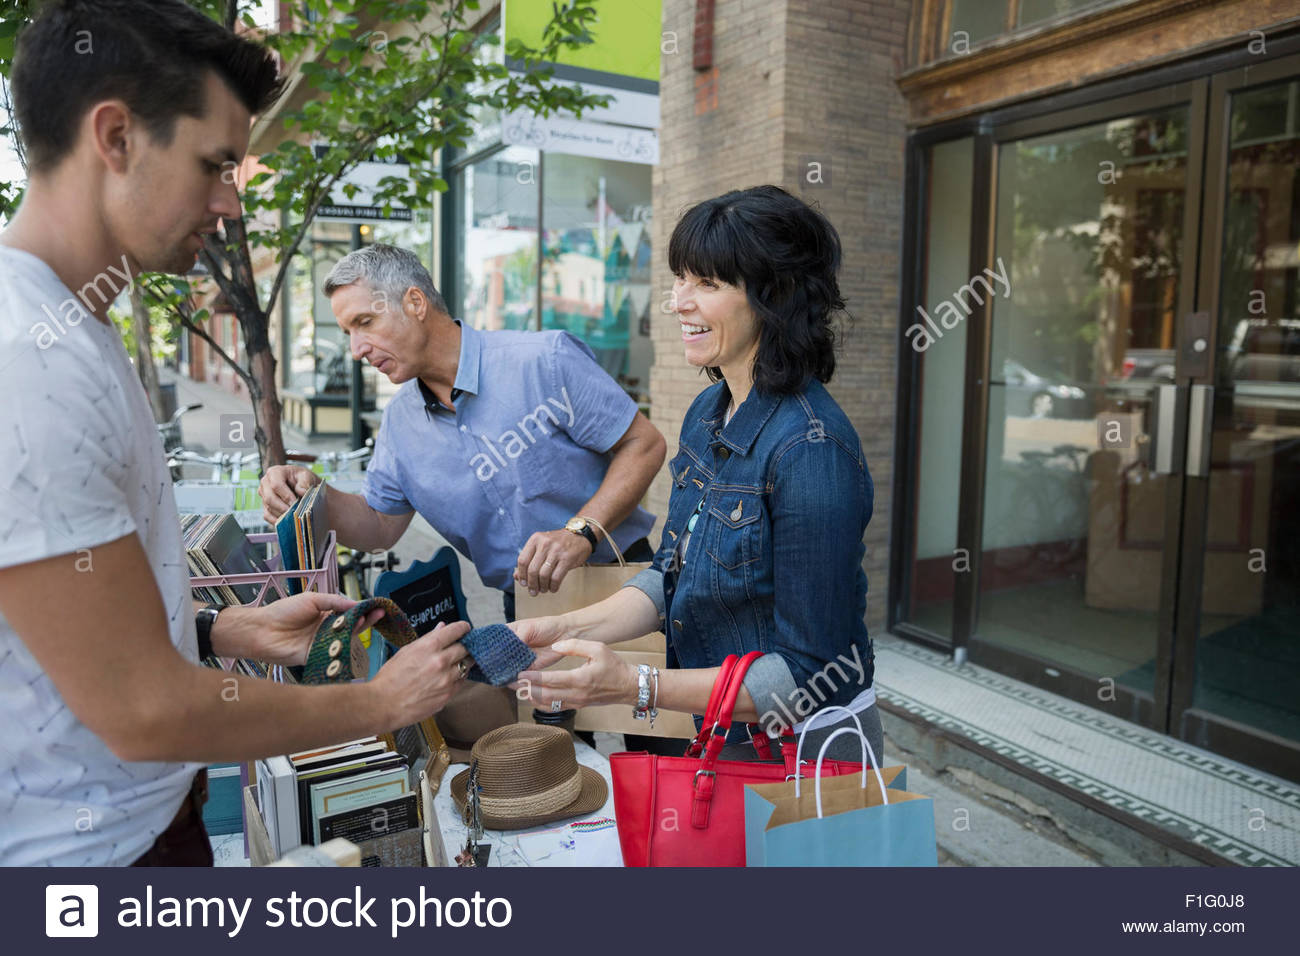 Frau shopping Bürgersteig Verkauf Stockbild